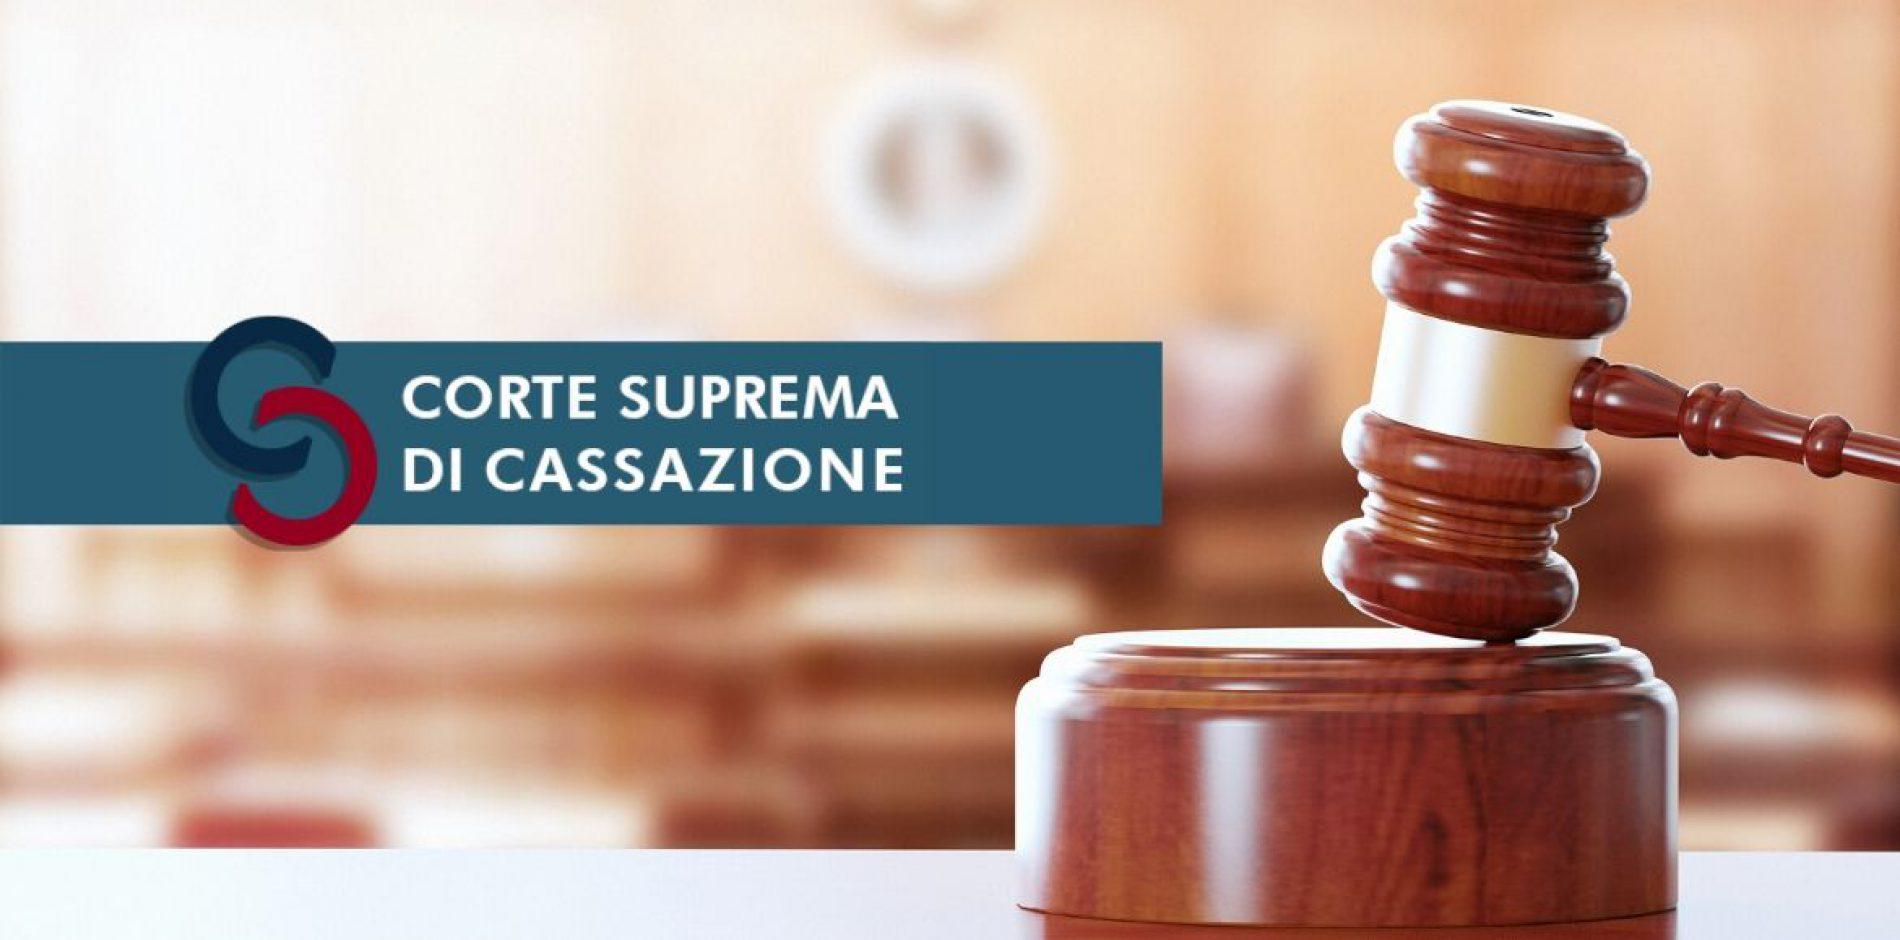 Licenziamento per detenzione di stupefacenti – sentenza n. 31531 [Cassazione]